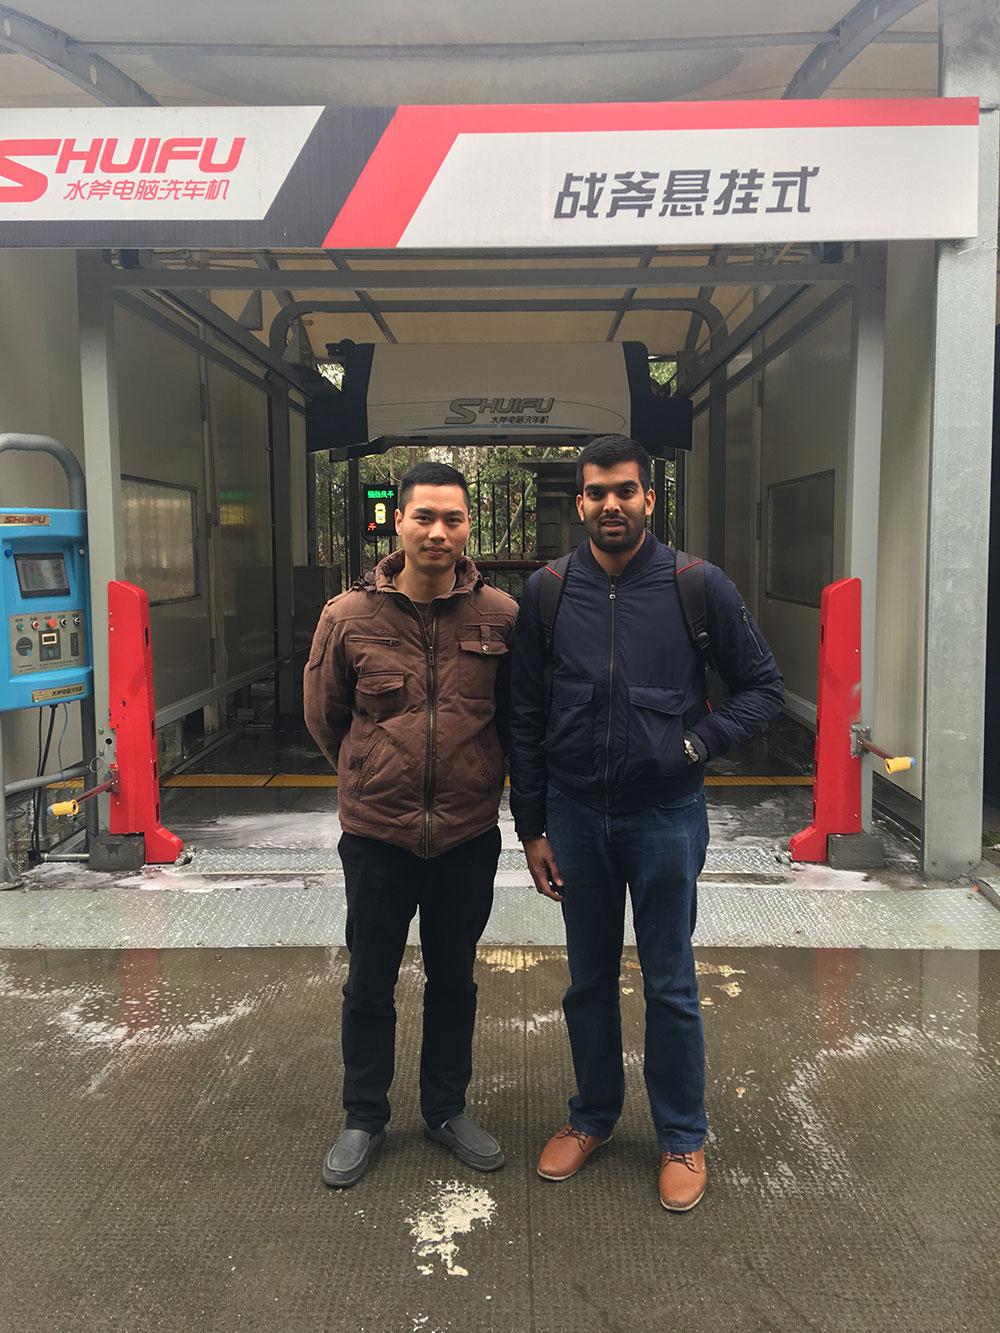 trinidad-and-tobago-south-america-touchless-car-wash-machine-customer-visit-shuifu-vehicle-washing-systems-and-factory